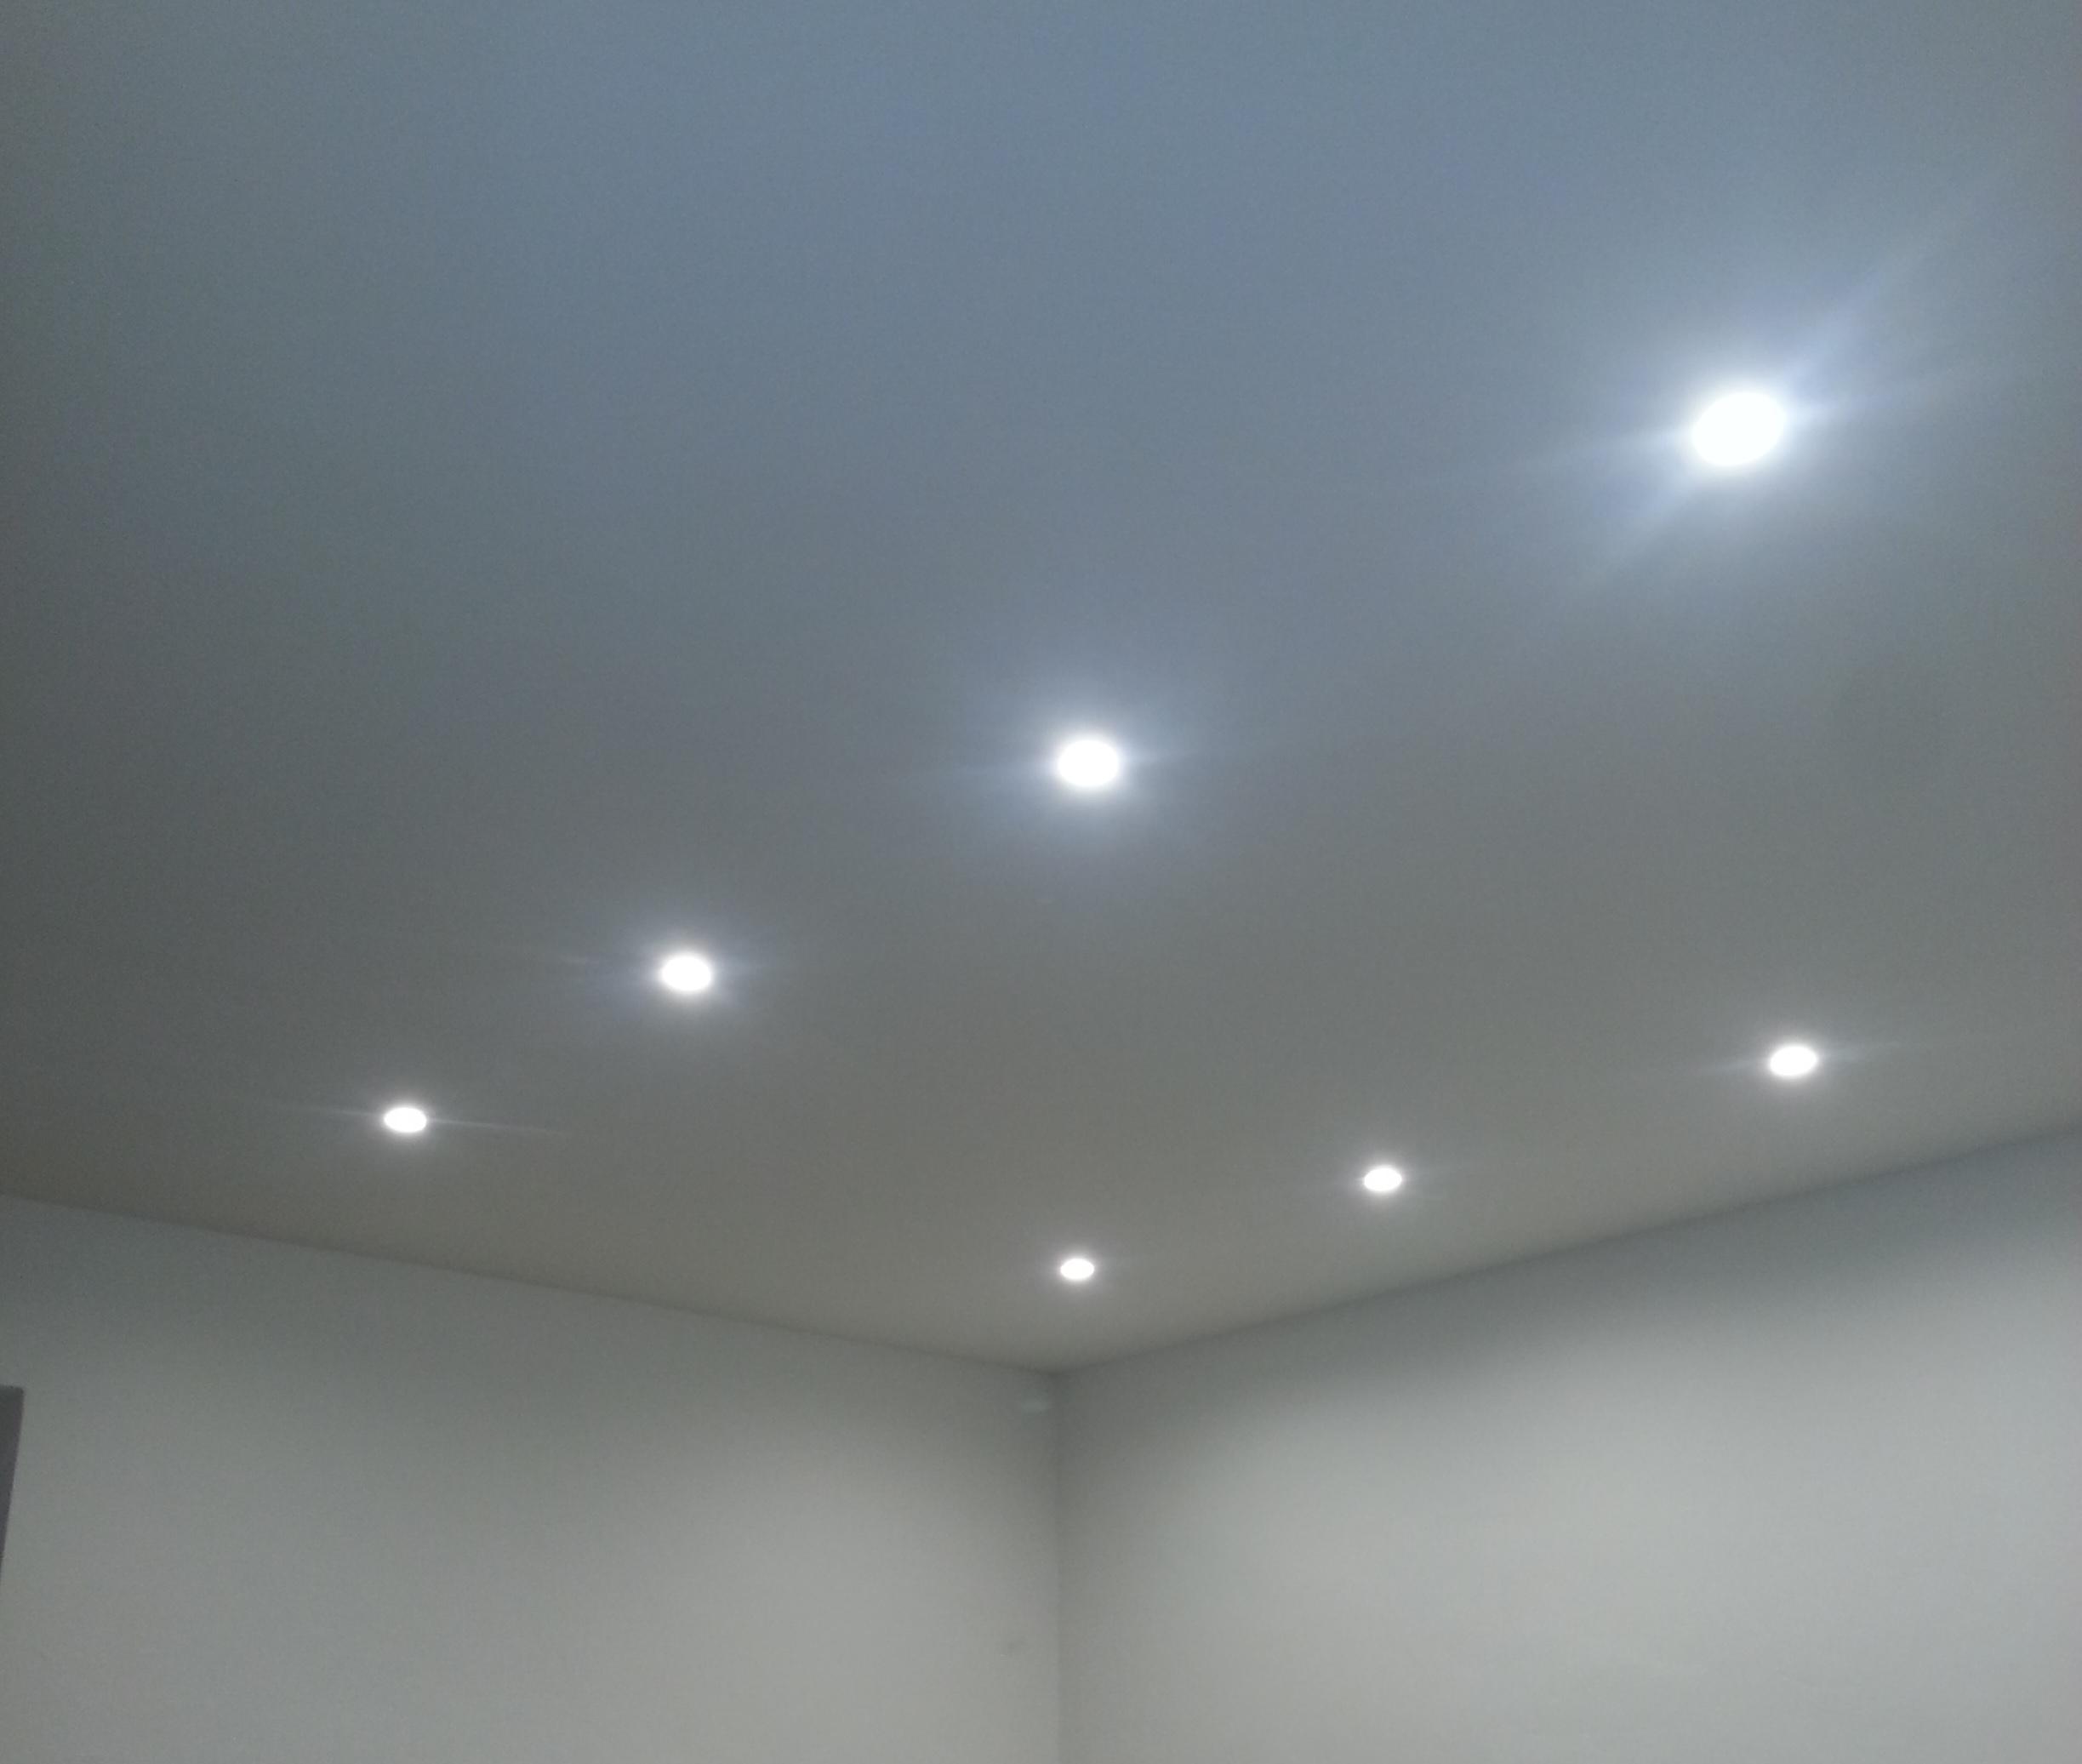 Impianti elettrici illuminazione - Punti luce in casa ...